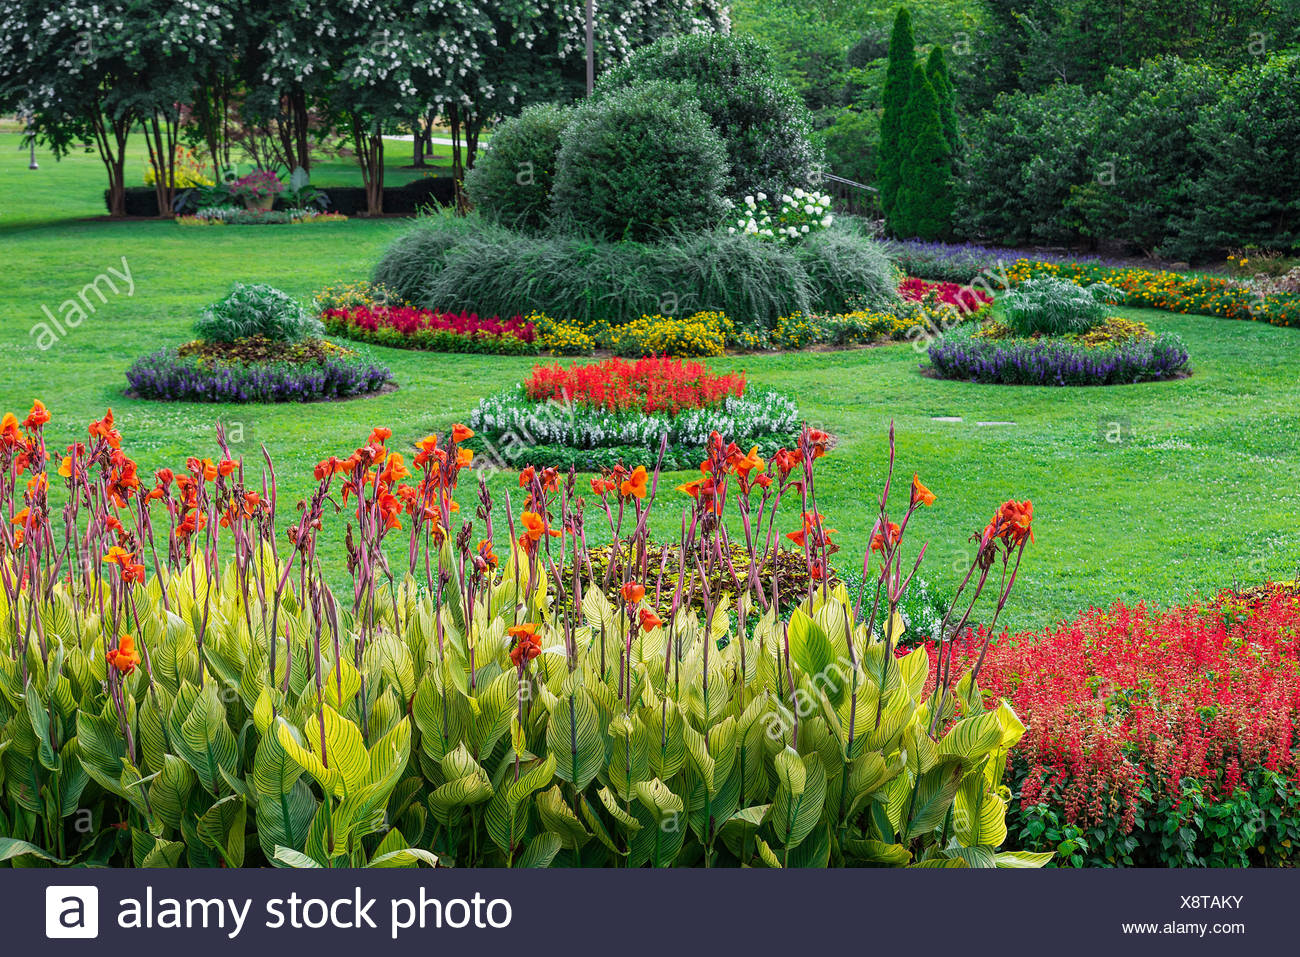 The Sunken Garden at Centennial Park, Nashville, Tennessee, USA. - Stock Image